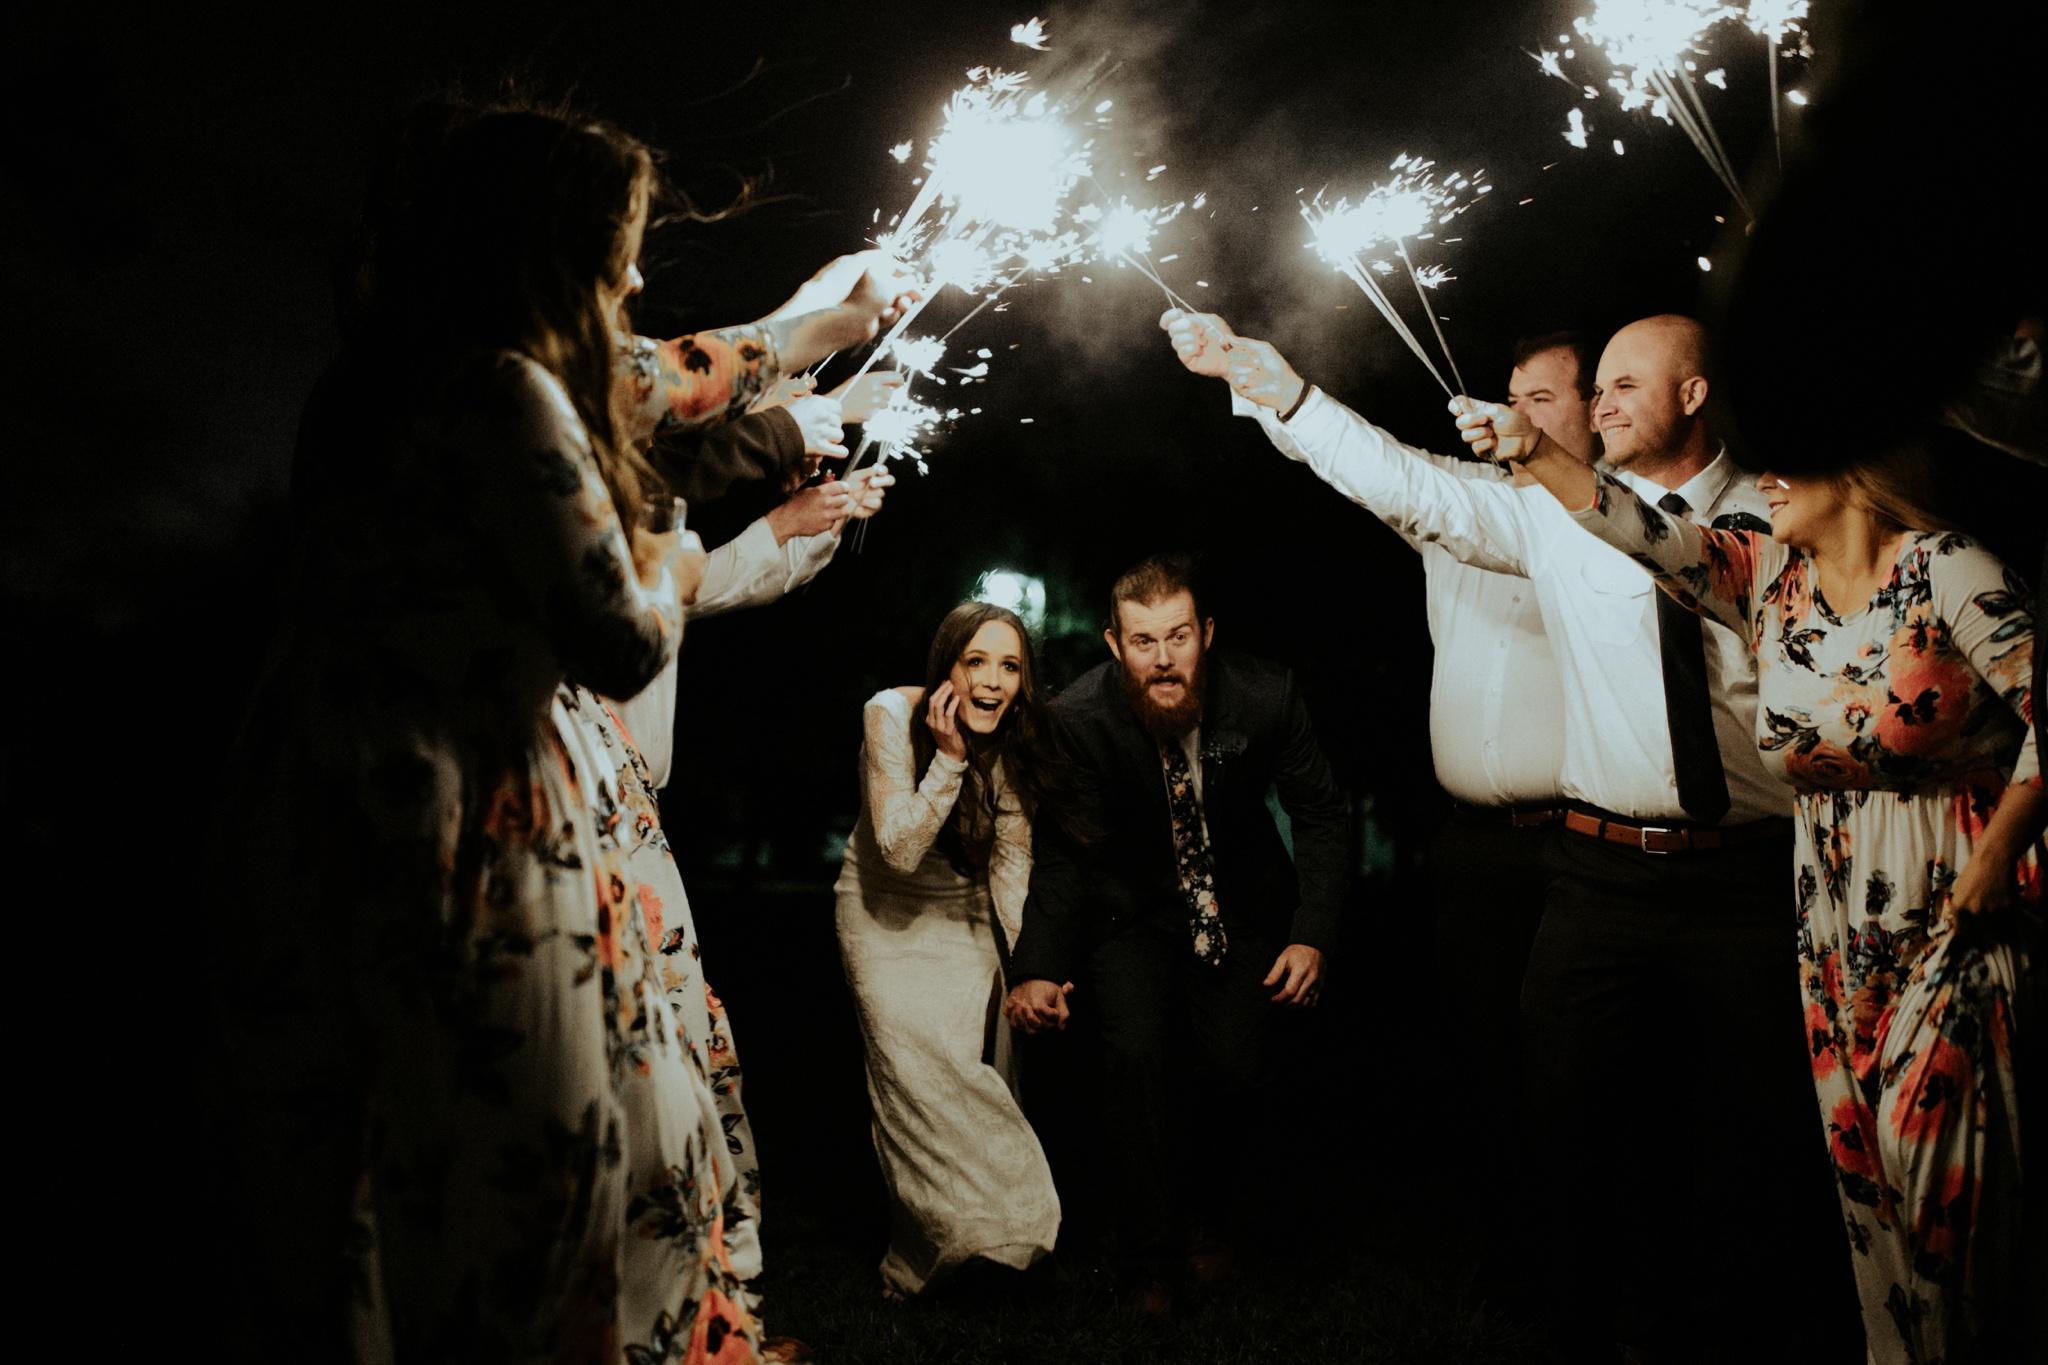 trinjensen photography, nebraska outdoor wedding photographer_3109.jpg